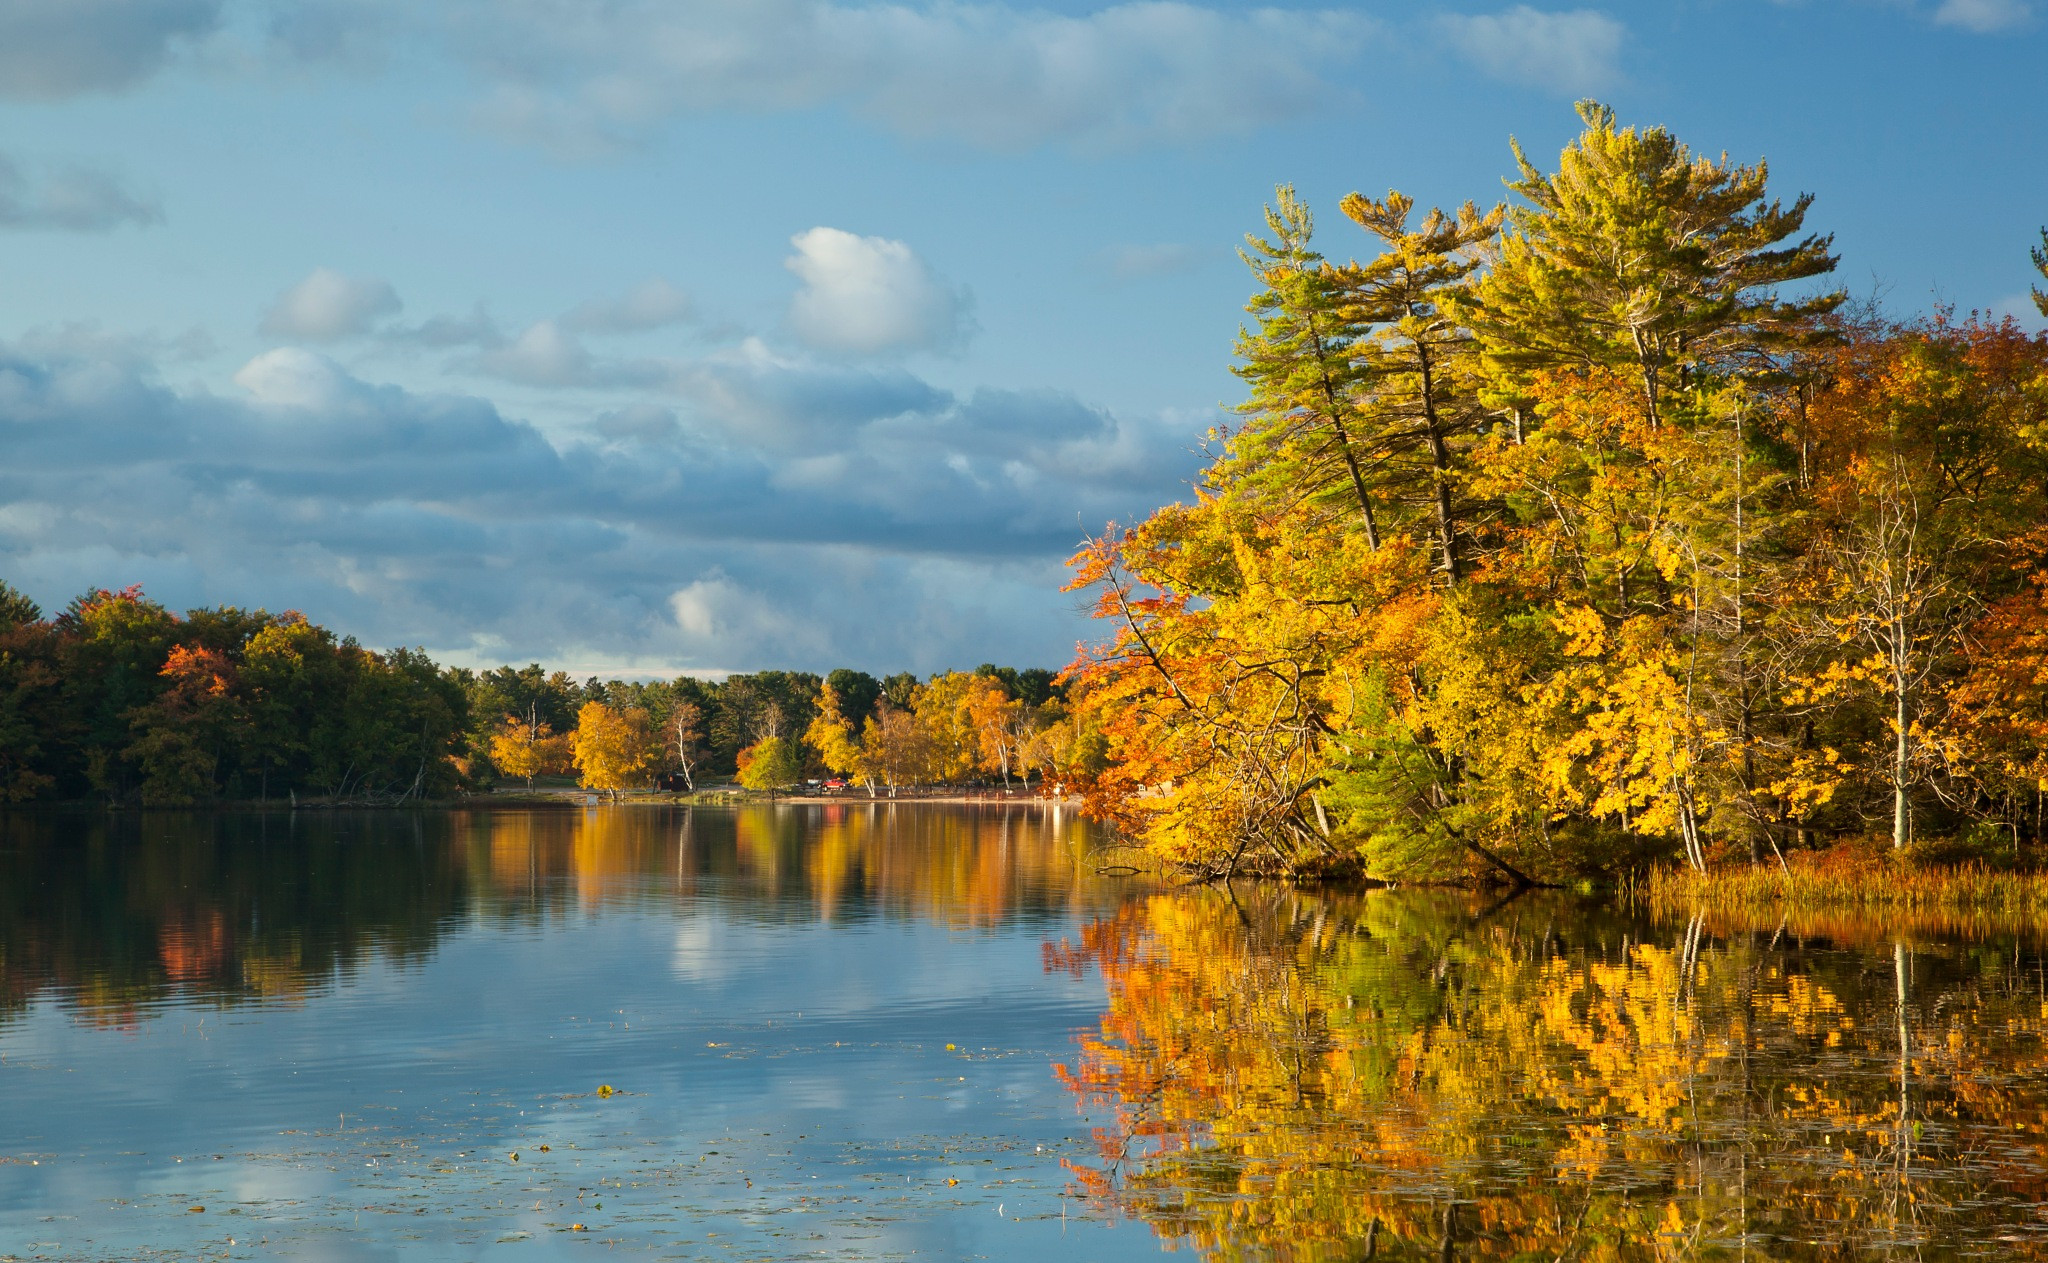 Autumn Colors Over Hamlin Lake by Kevin Kludy